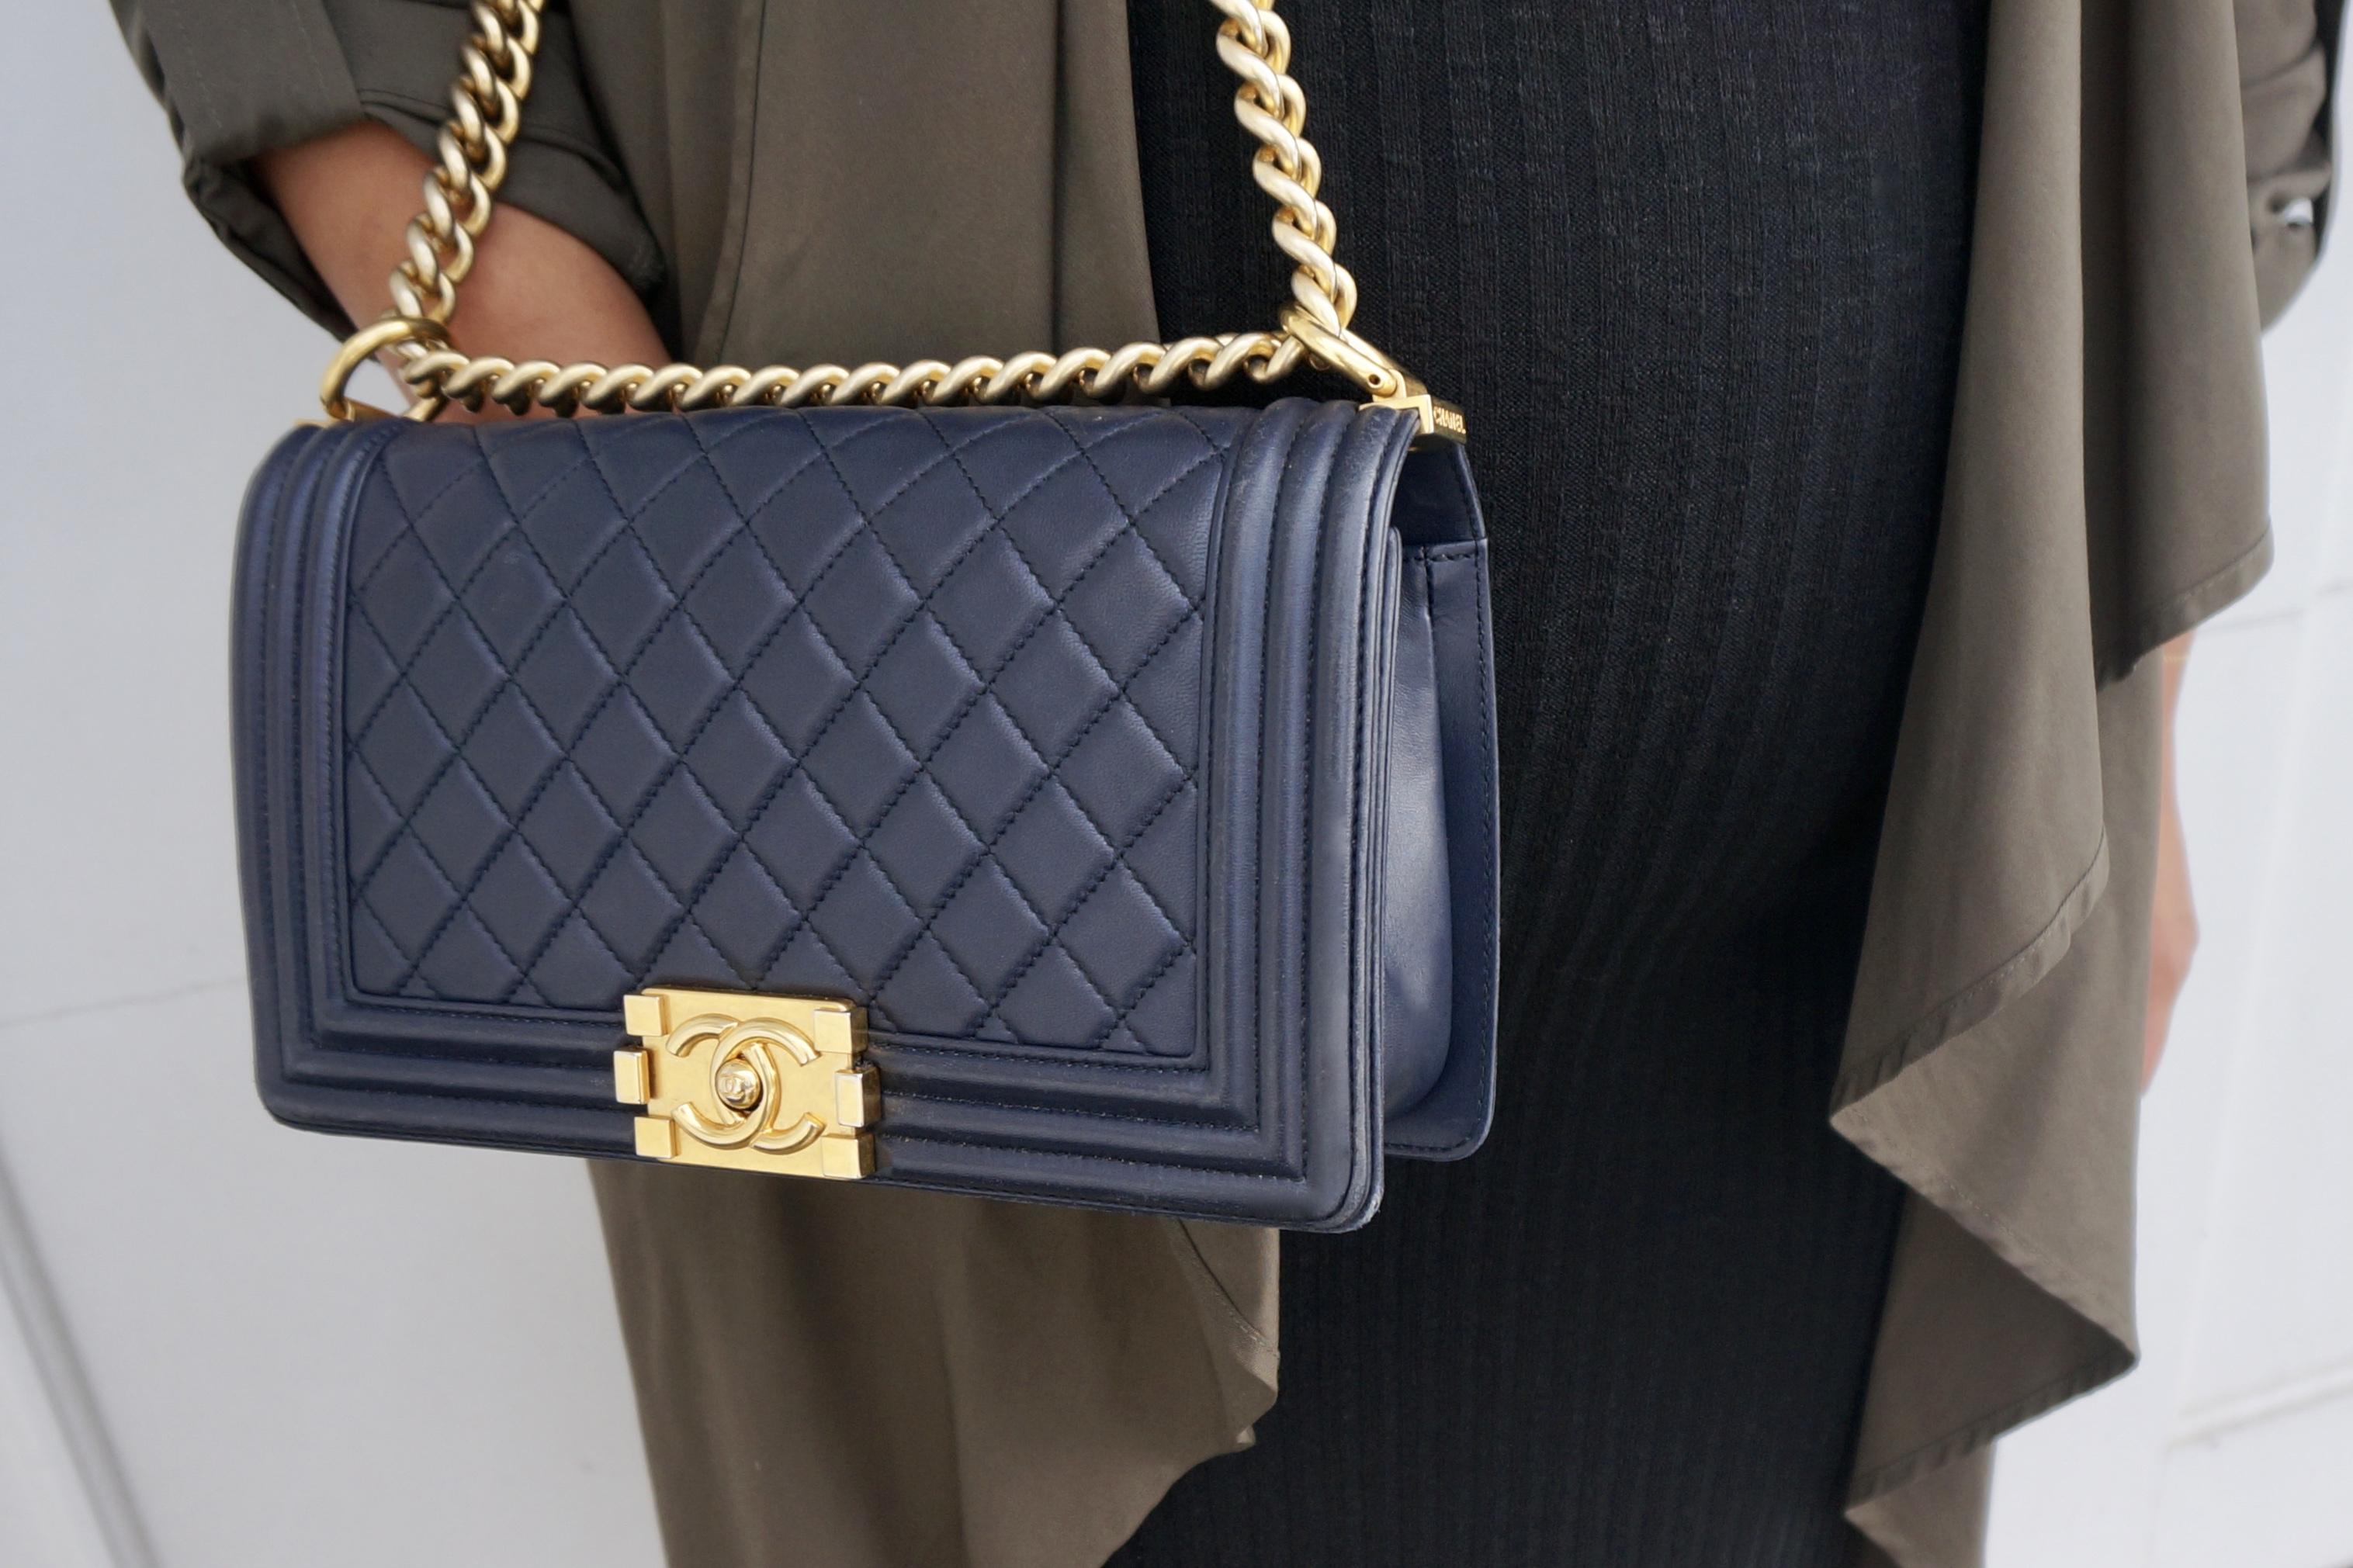 Chanel Boy Bag Navy Gold Hardware – Glam York f34e05b079e4